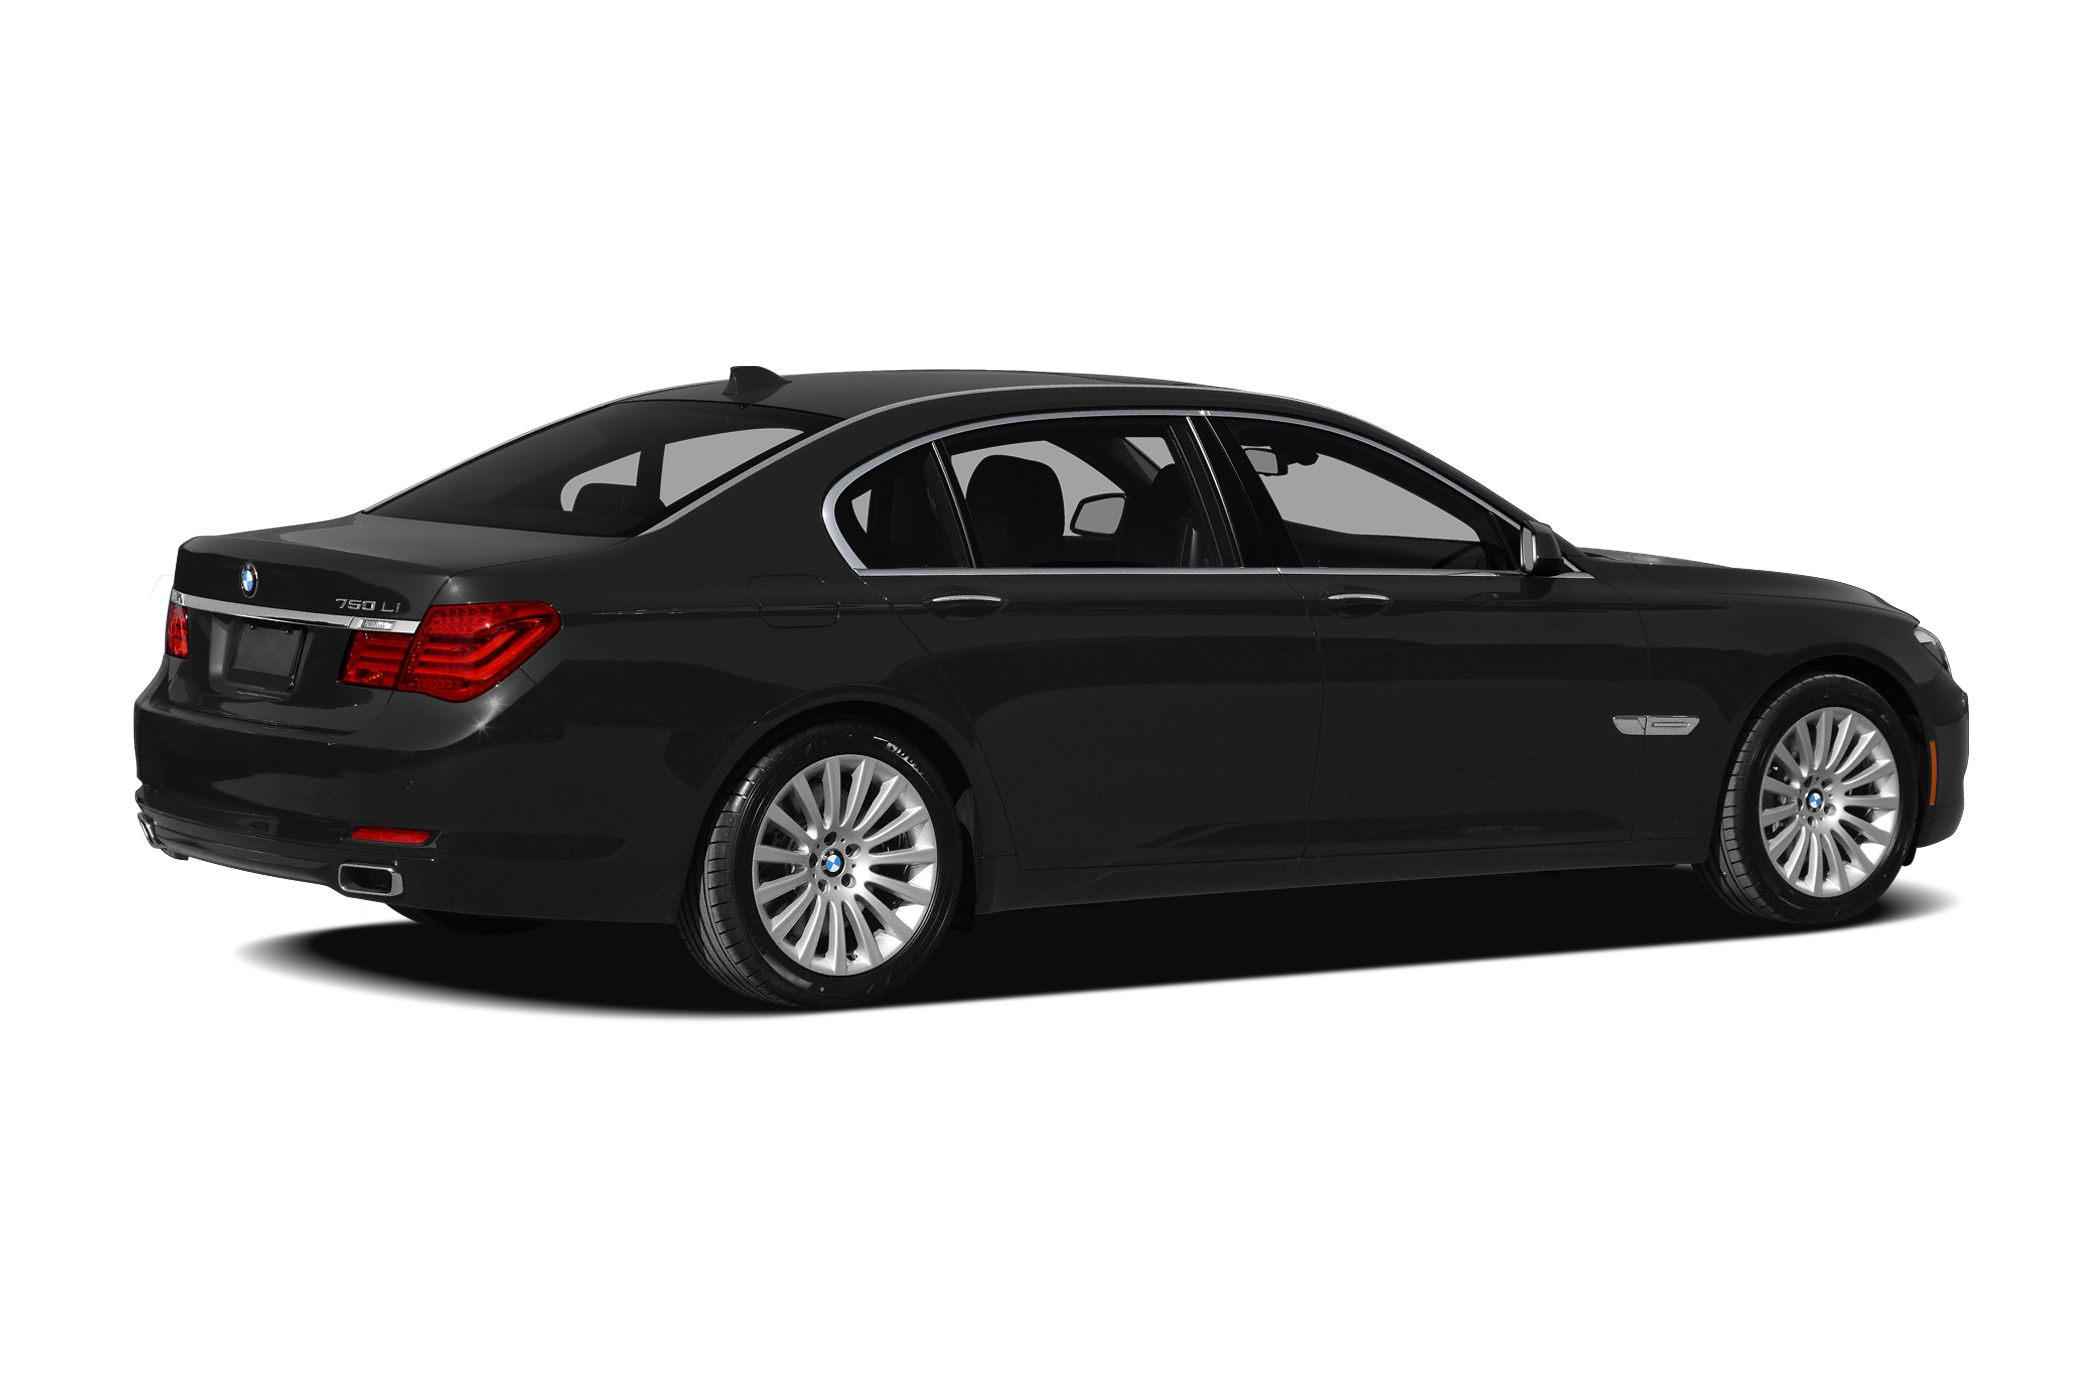 2010 BMW 7 Series 750i xDrive AWD Dark Grey Clean CARFAX Recent Arrival Odometer is 32462 miles